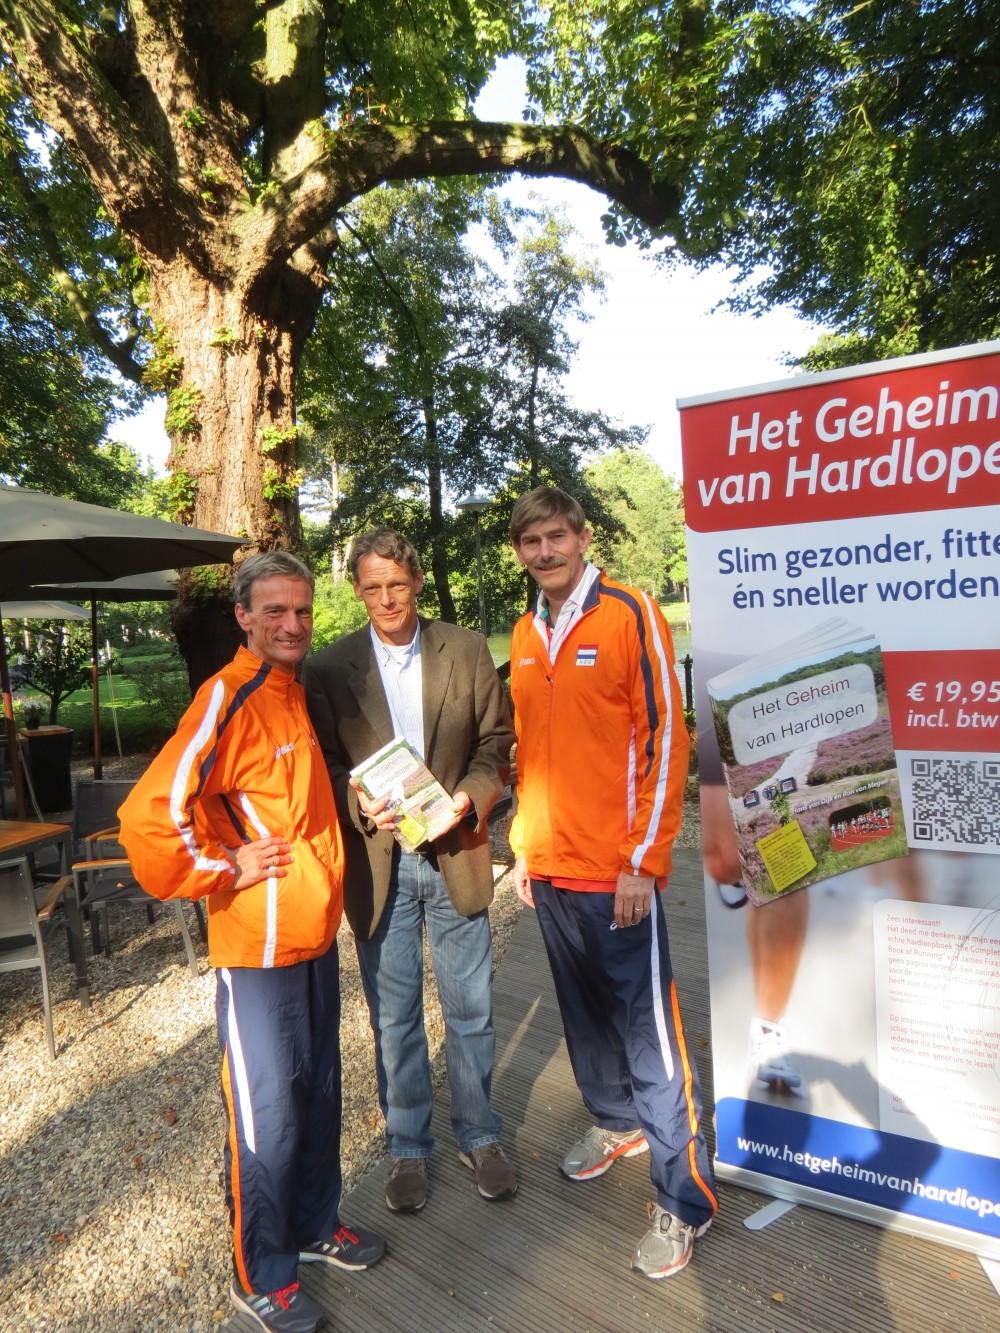 20130929 09 1e boek Gerard Nijboer NK 10 km Singelloop Utrecht (2)